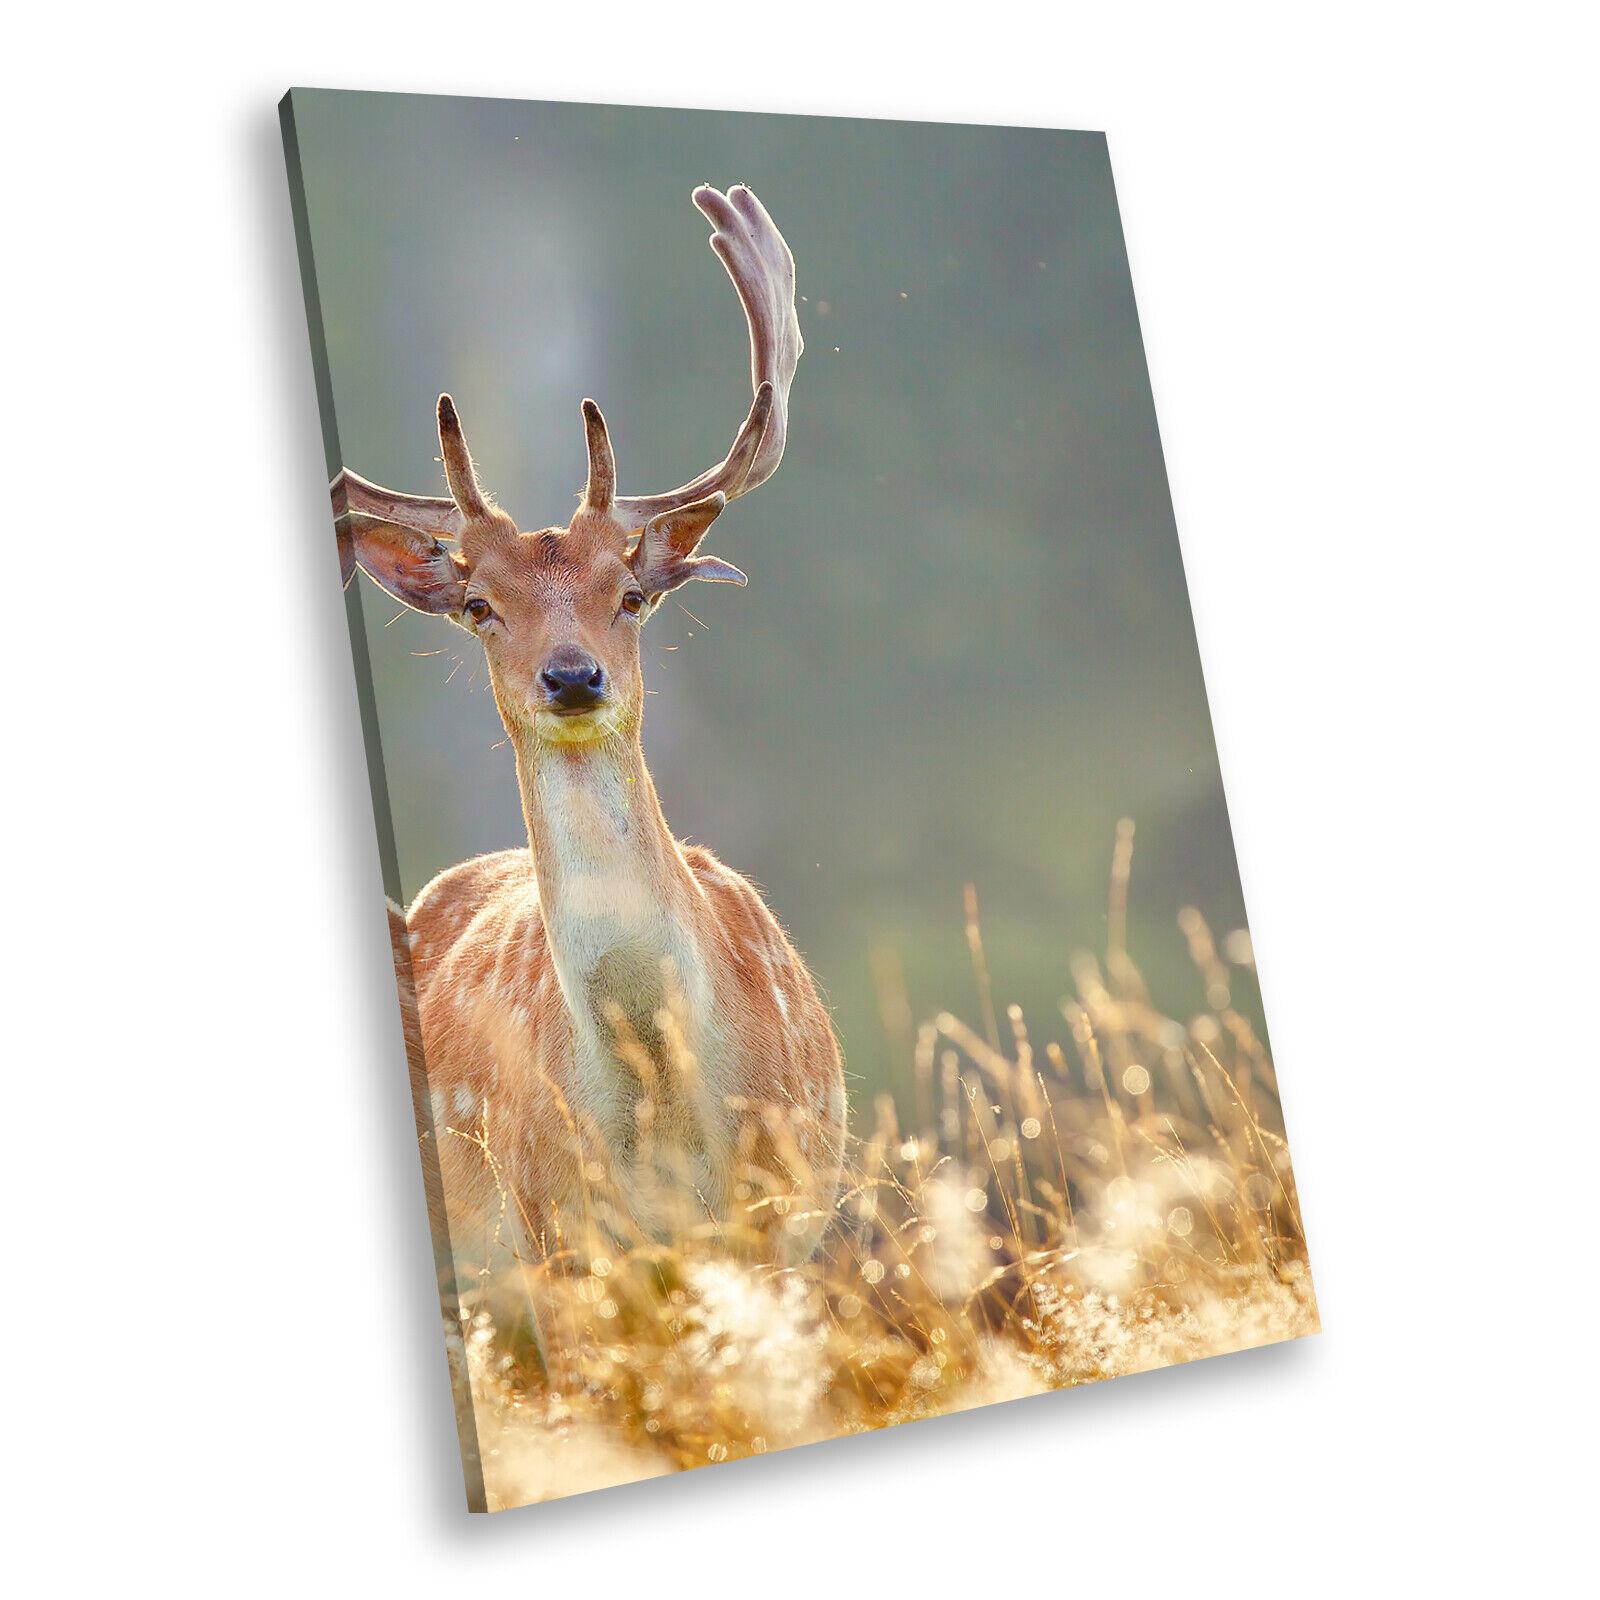 Stag Deer Blau Grün Grass Portrait Animal Canvas Wall Art Picture Prints